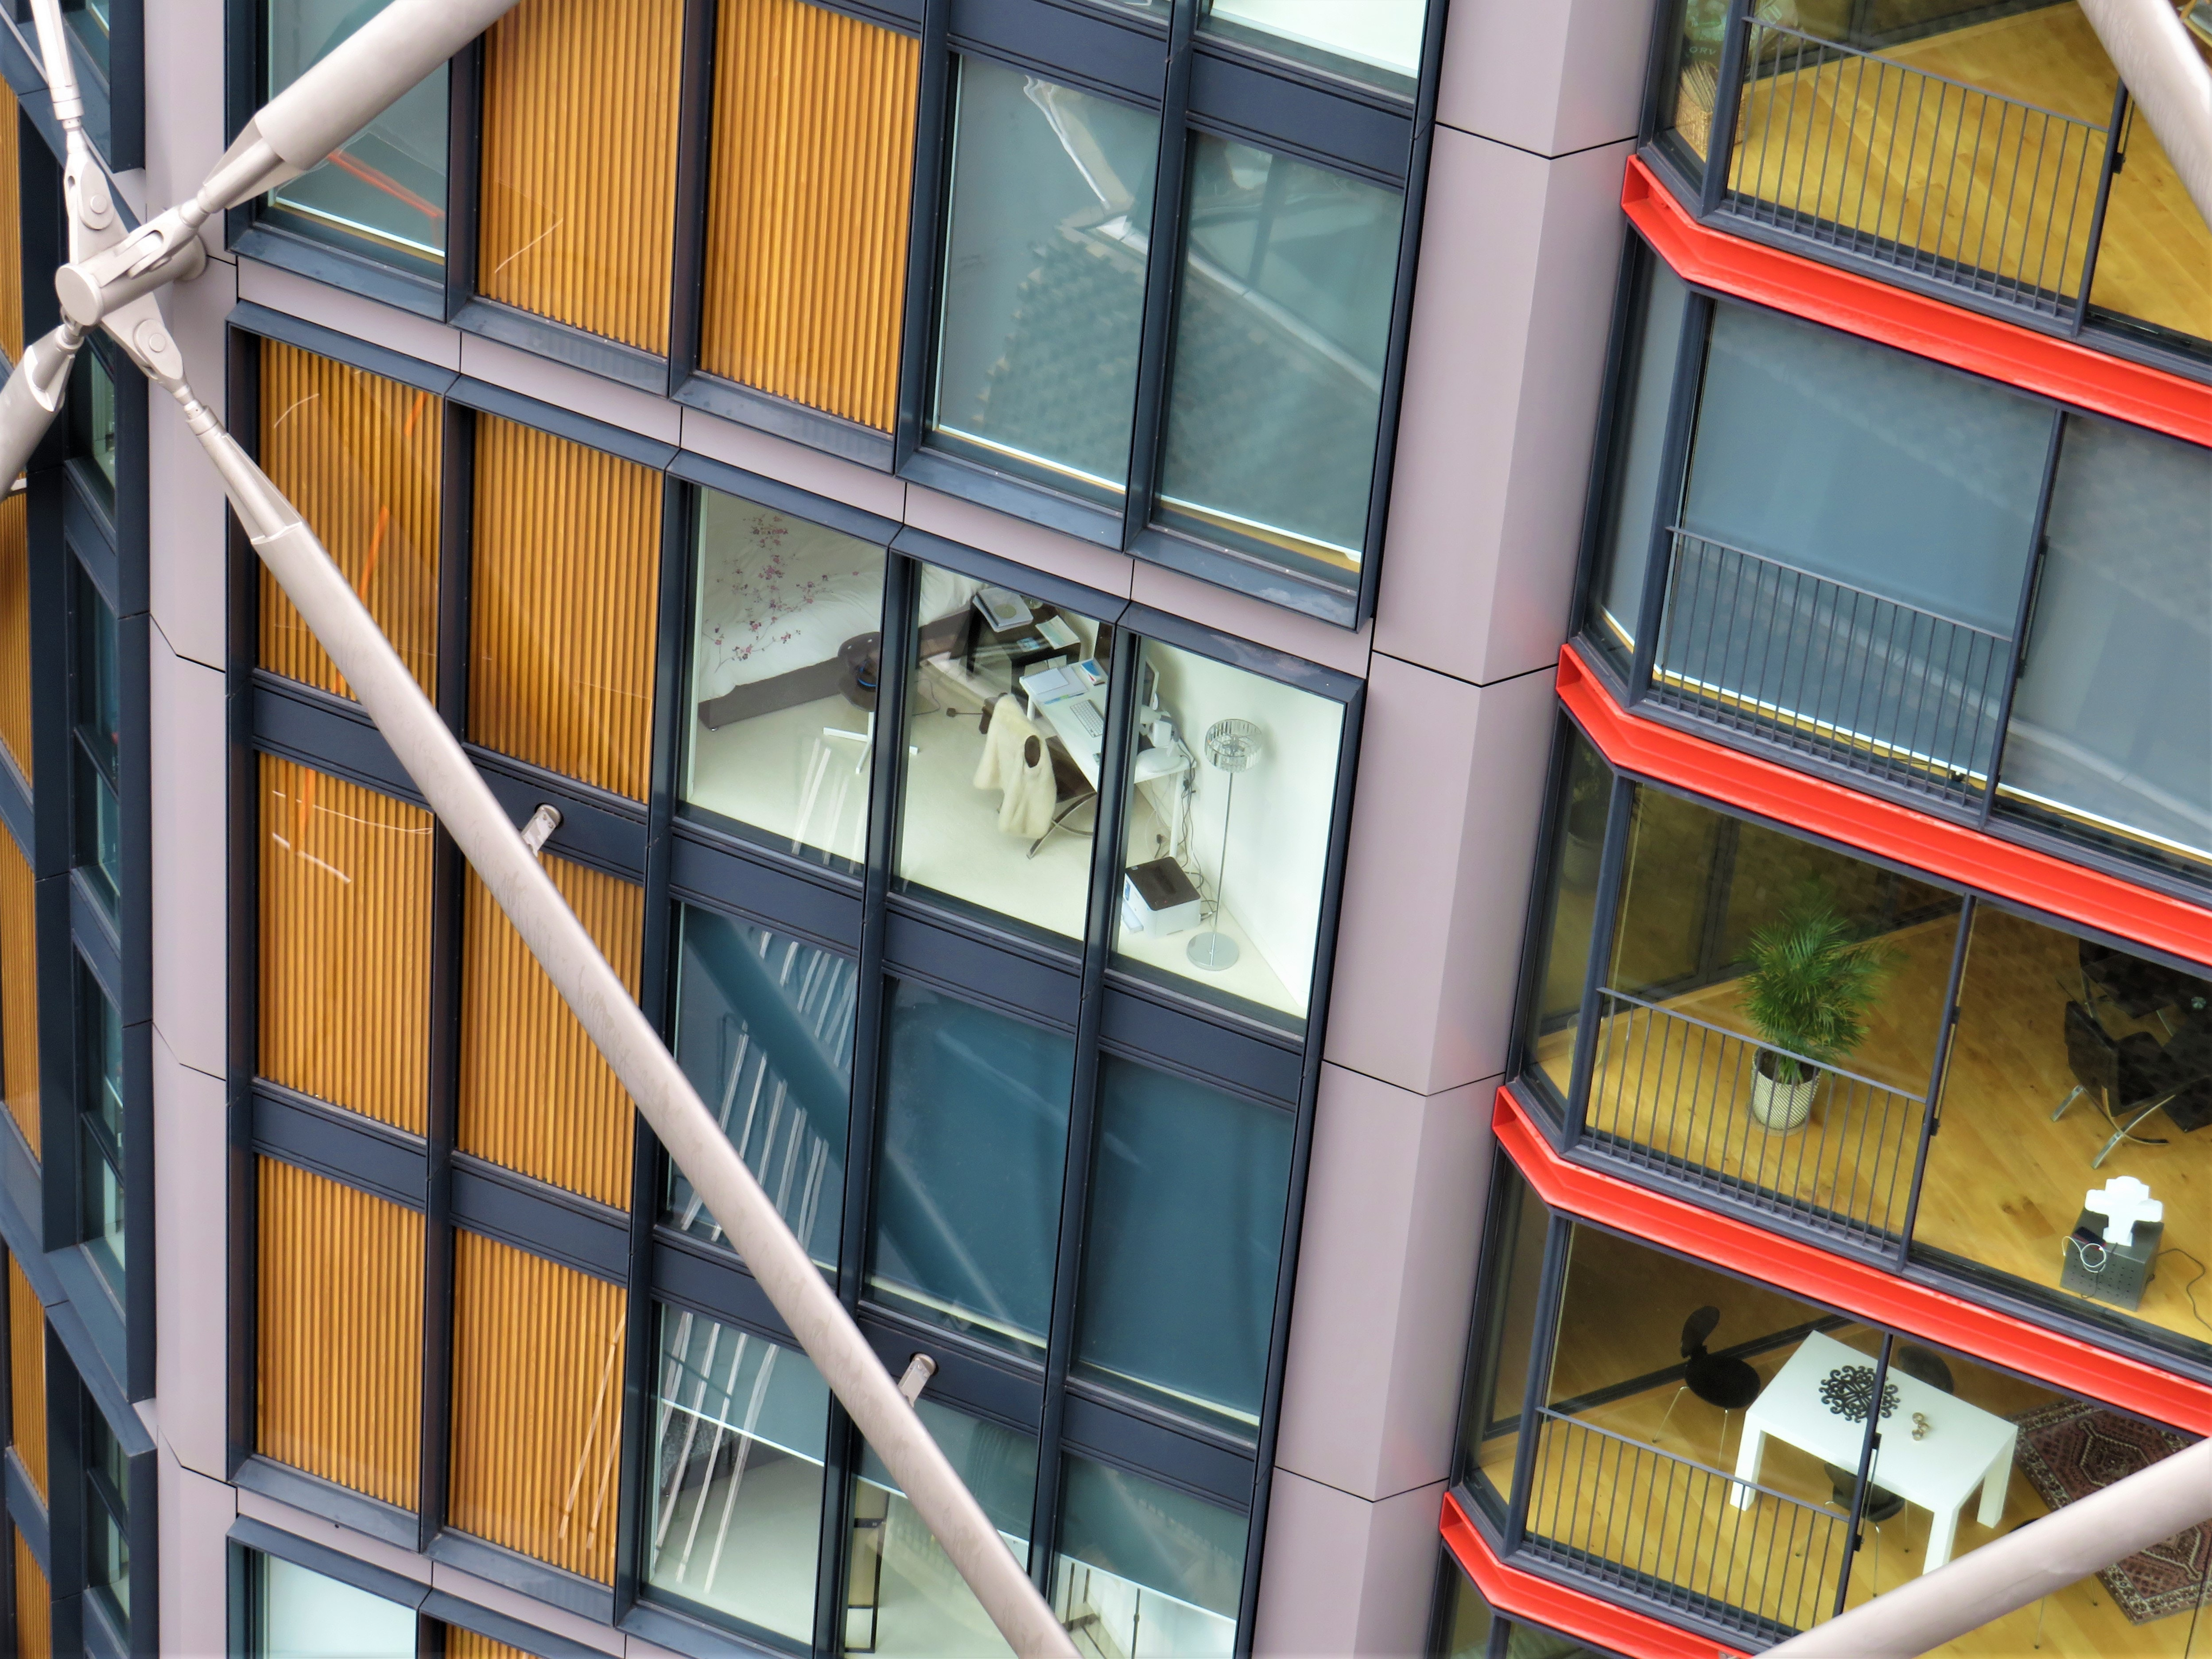 Steve Muylle (Vlerick Business School): 'Hoe stelt u uw carrière veilig?'